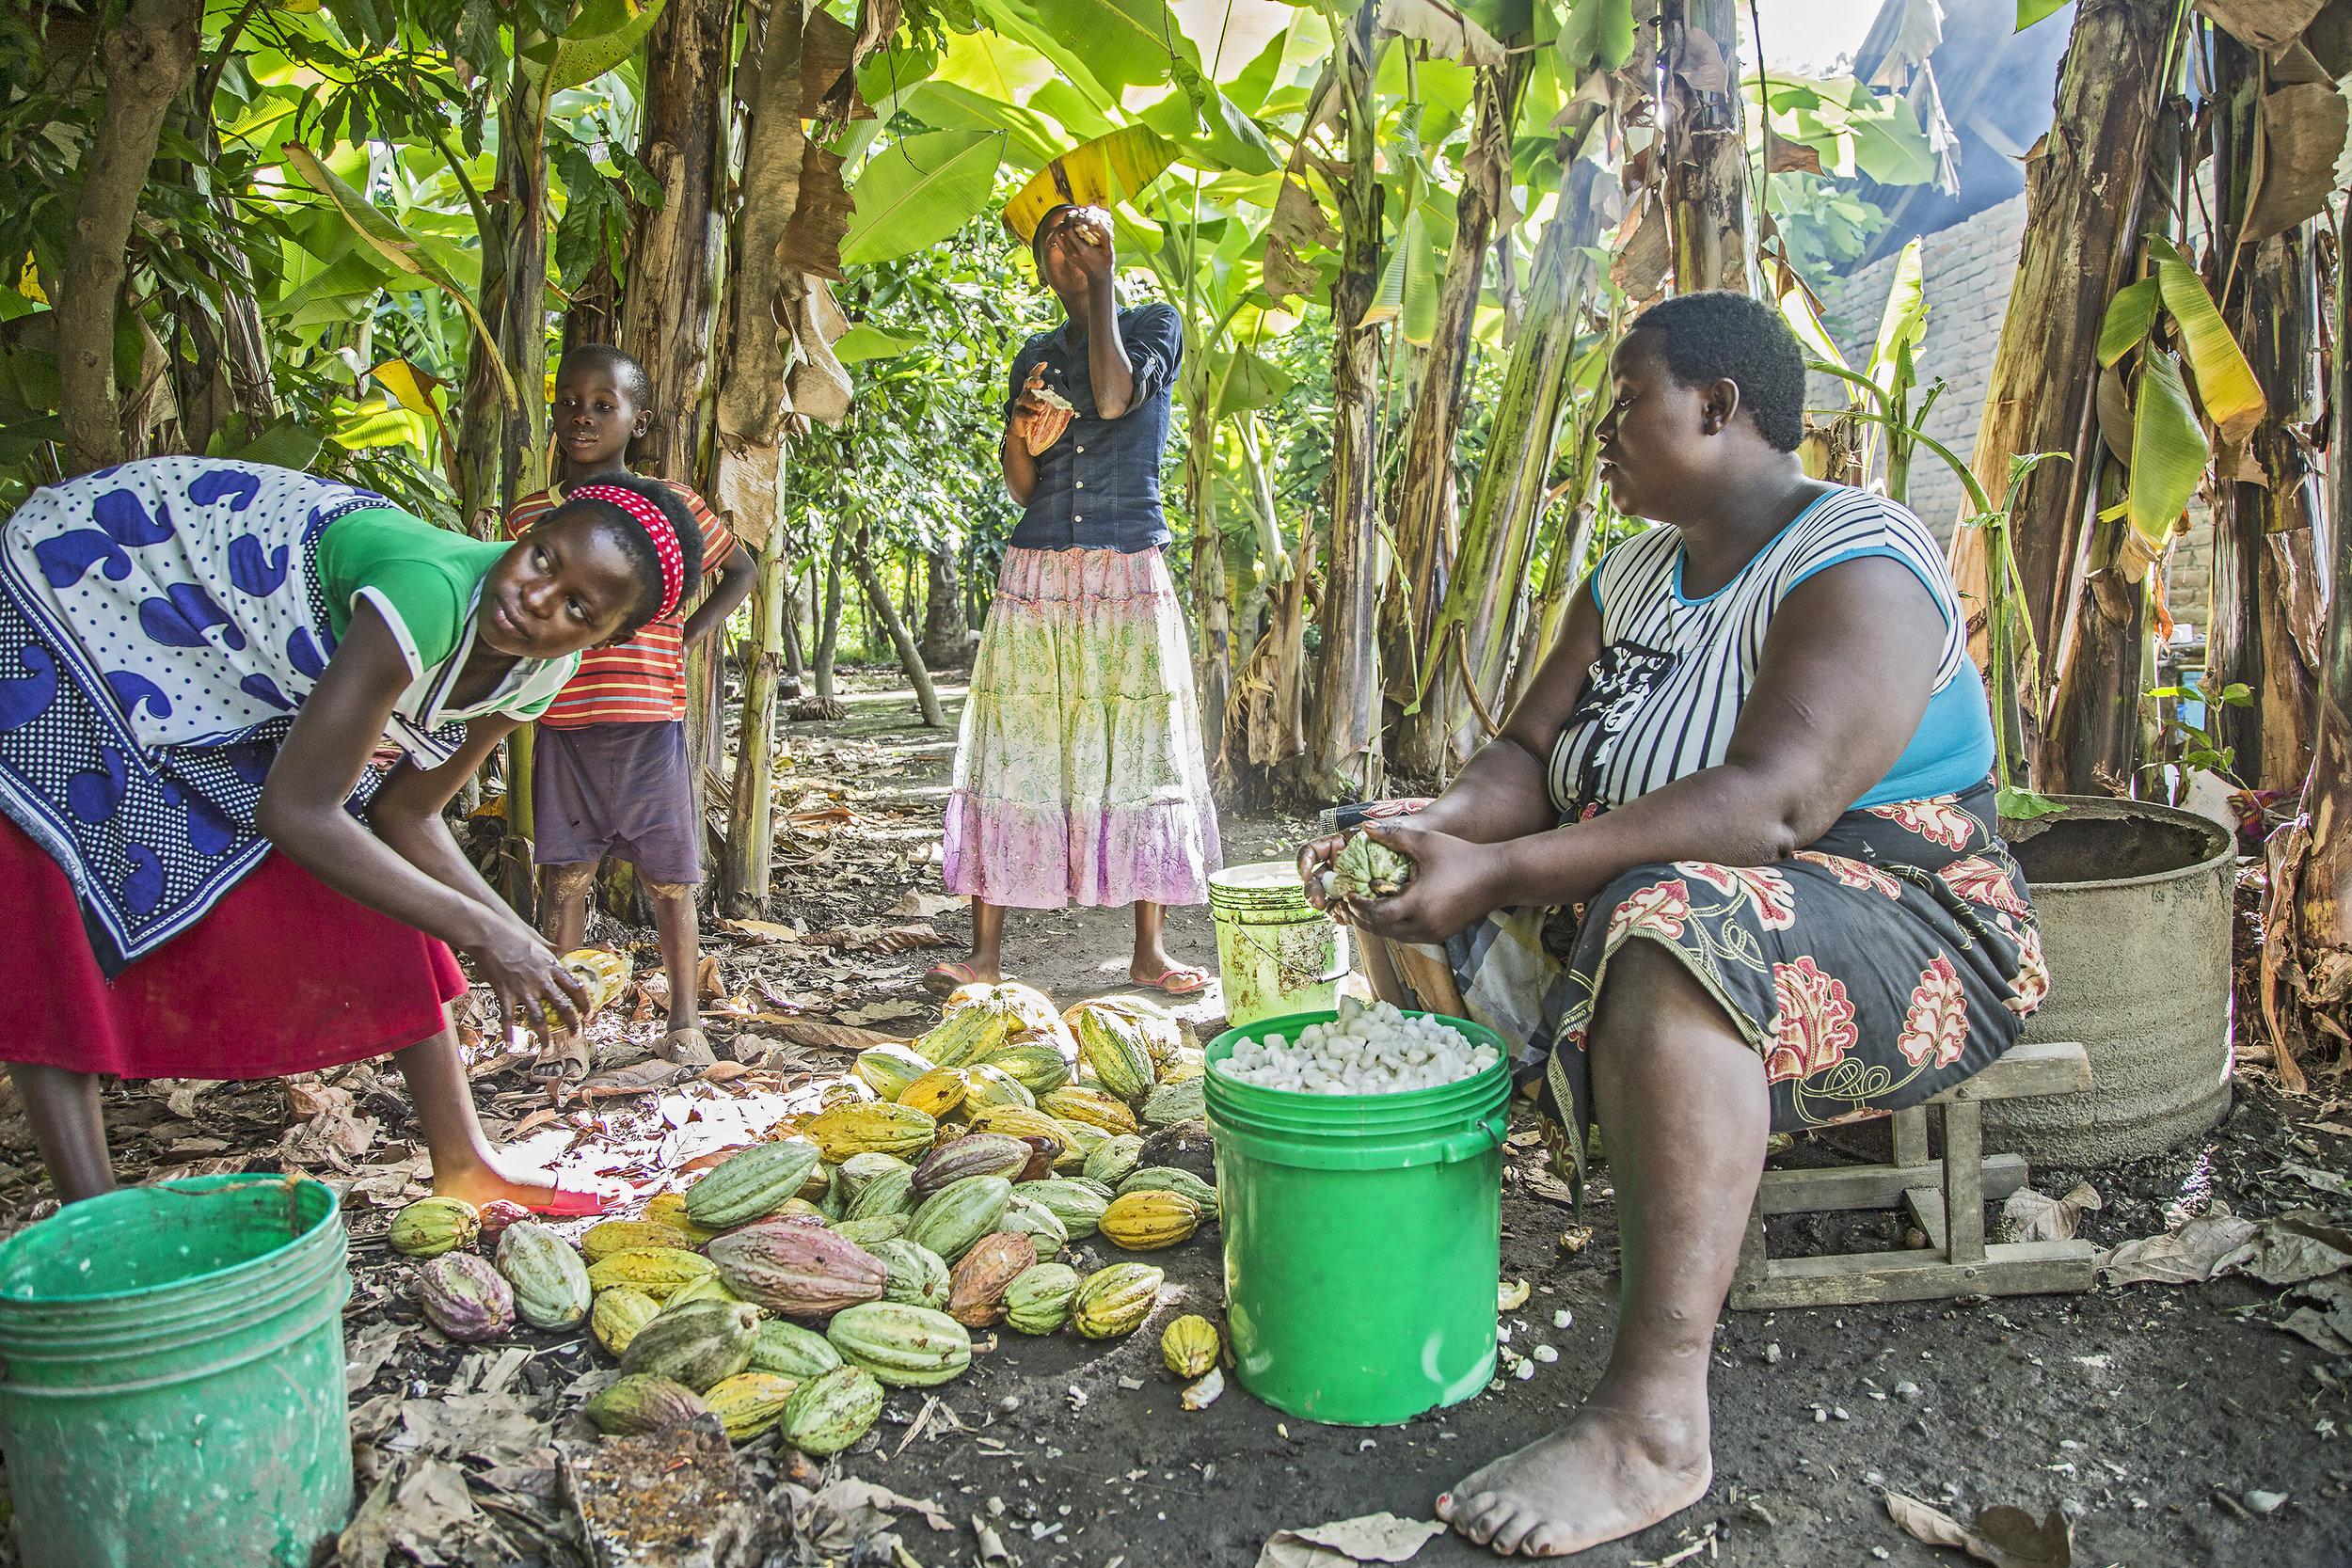 Enjoying the Cacao harvest in the Mbeya region, Tanzania.